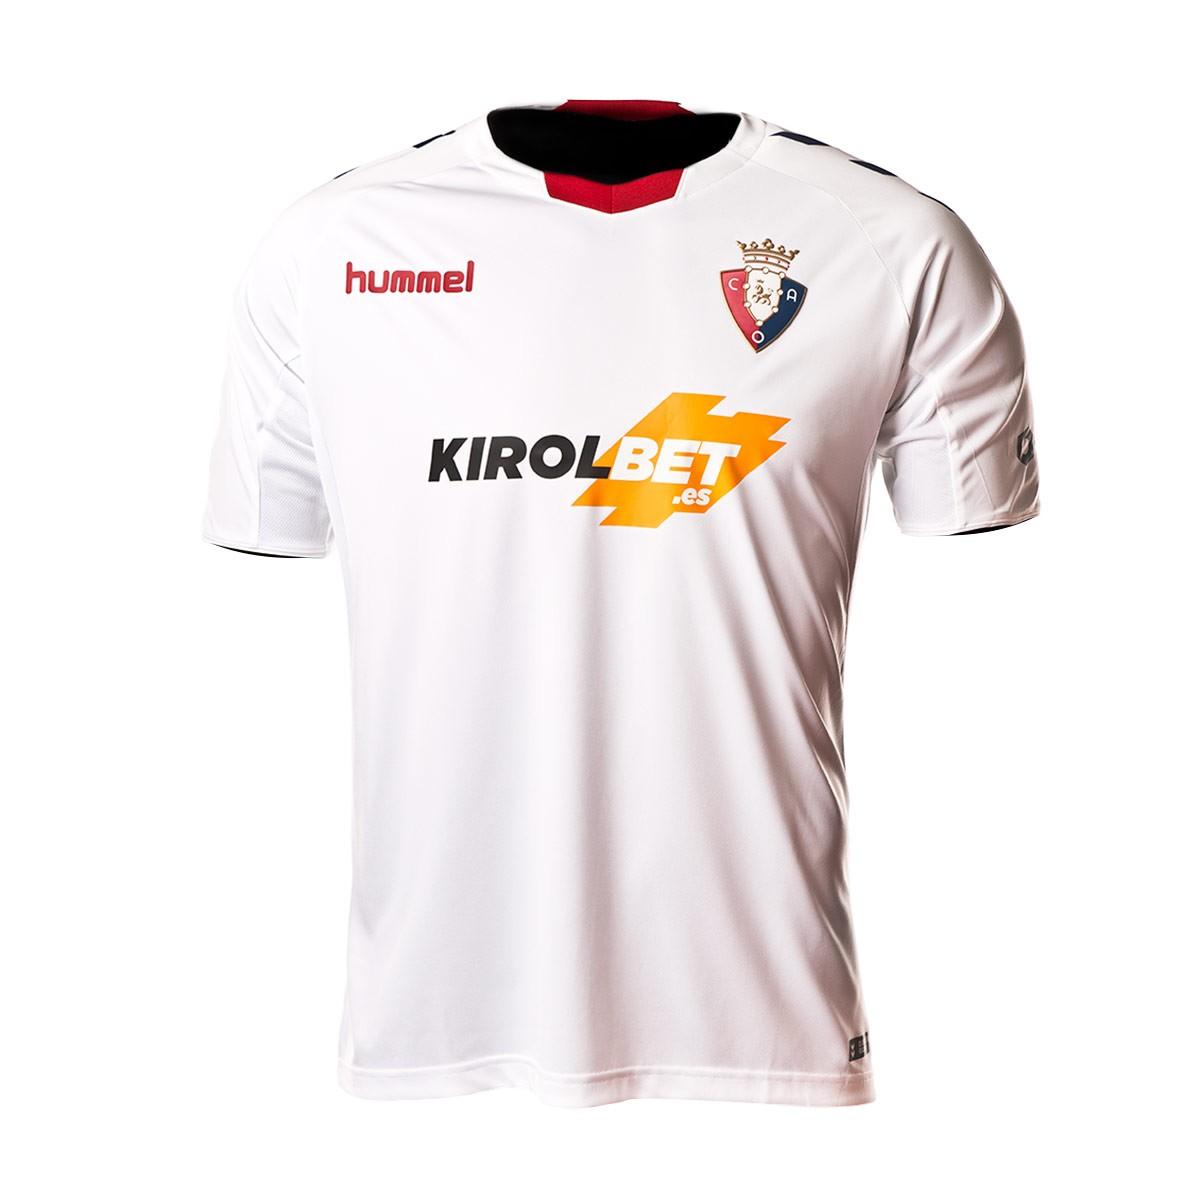 Camiseta Hummel CA Osasuna Tercera Equipación 2018-2019 White-Marine -  Soloporteros es ahora Fútbol Emotion 5980bcfa2e85f